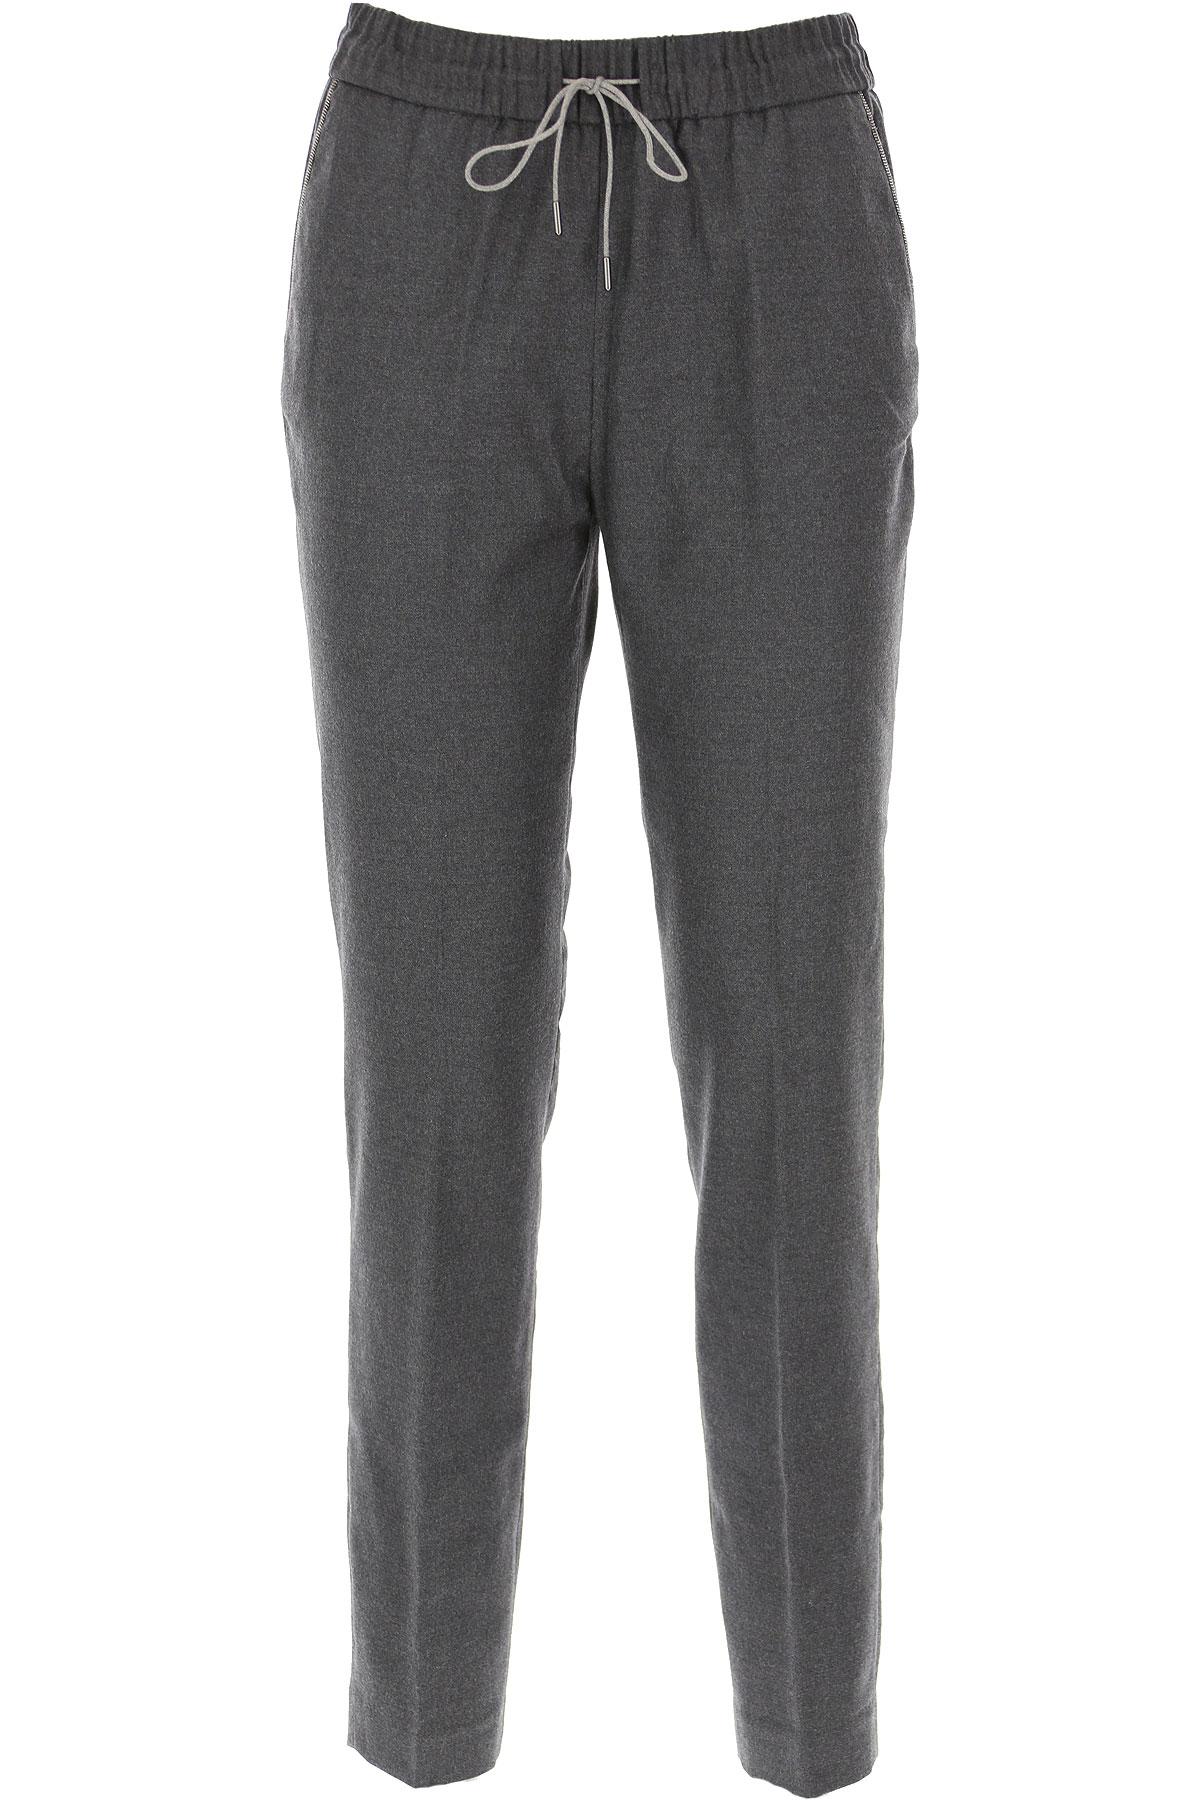 Fabiana Filippi Pants for Women On Sale, Anthracite Grey, merino wool, 2019, 24 28 30 34